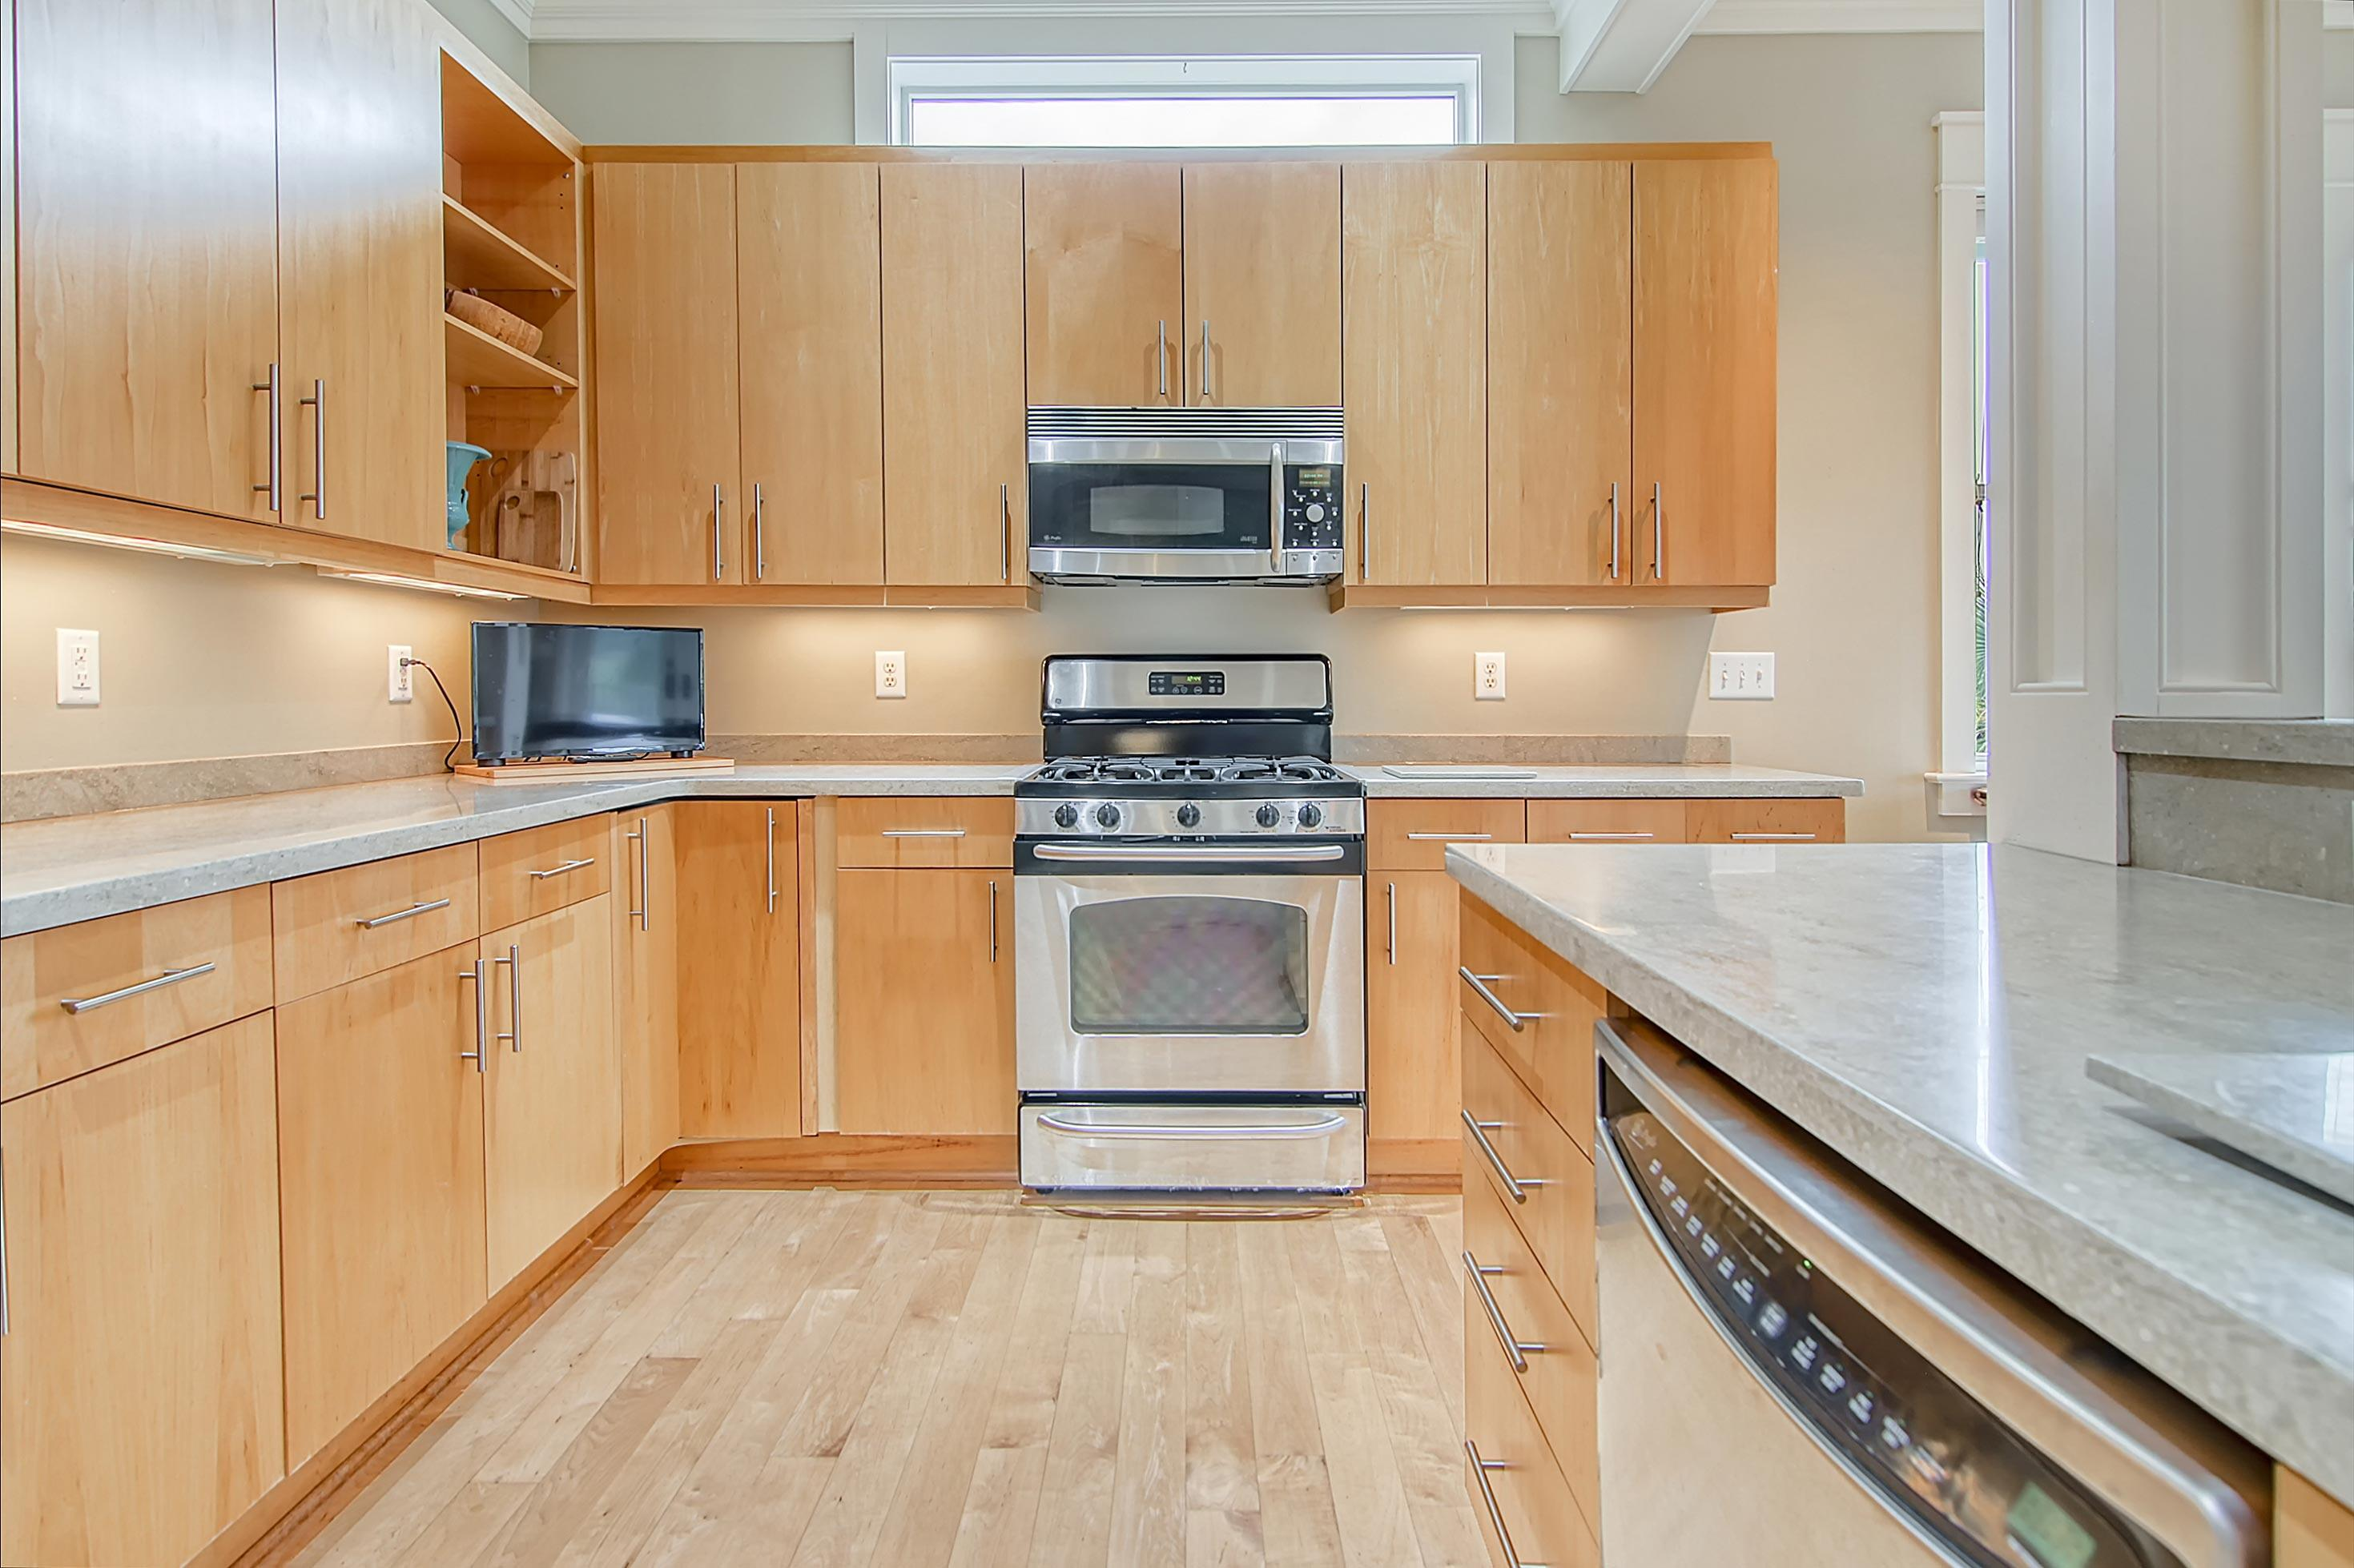 Scanlonville Homes For Sale - 152 6th, Mount Pleasant, SC - 51